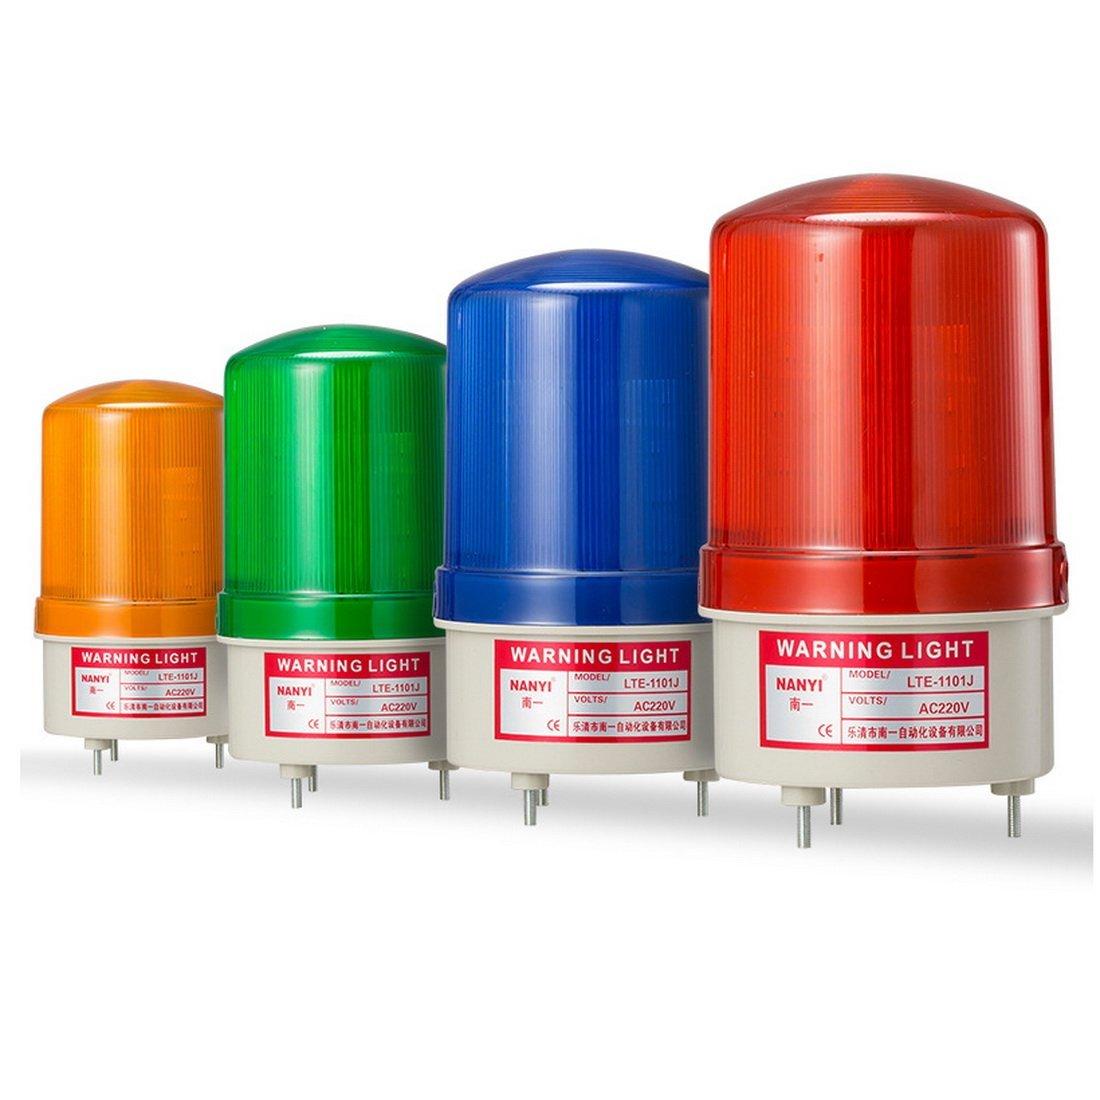 Amazon.com: WerFamily 100-110dB Buzzer Industrial AC 110V ...